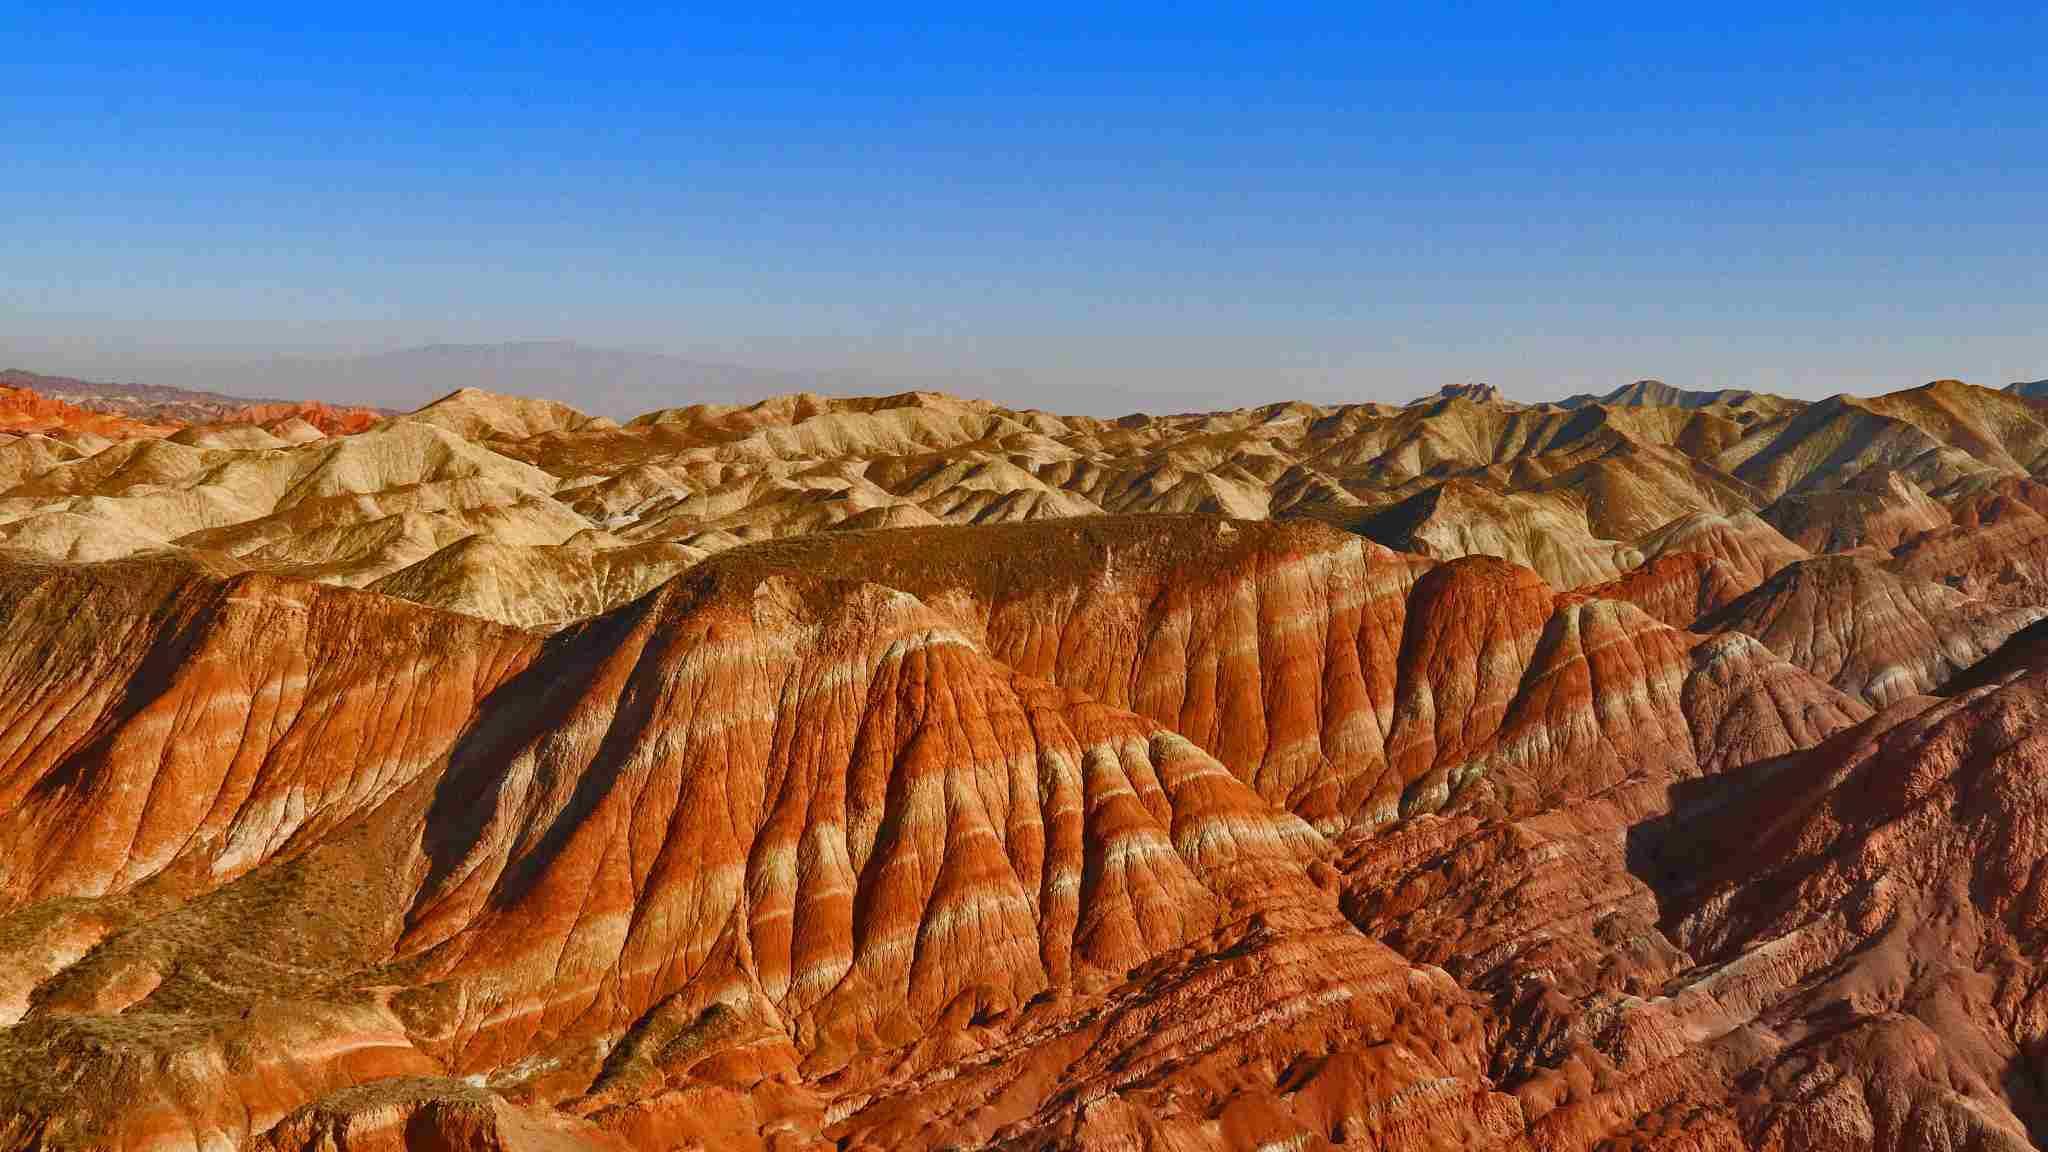 Stunning scenery of Danxia landform in NW China